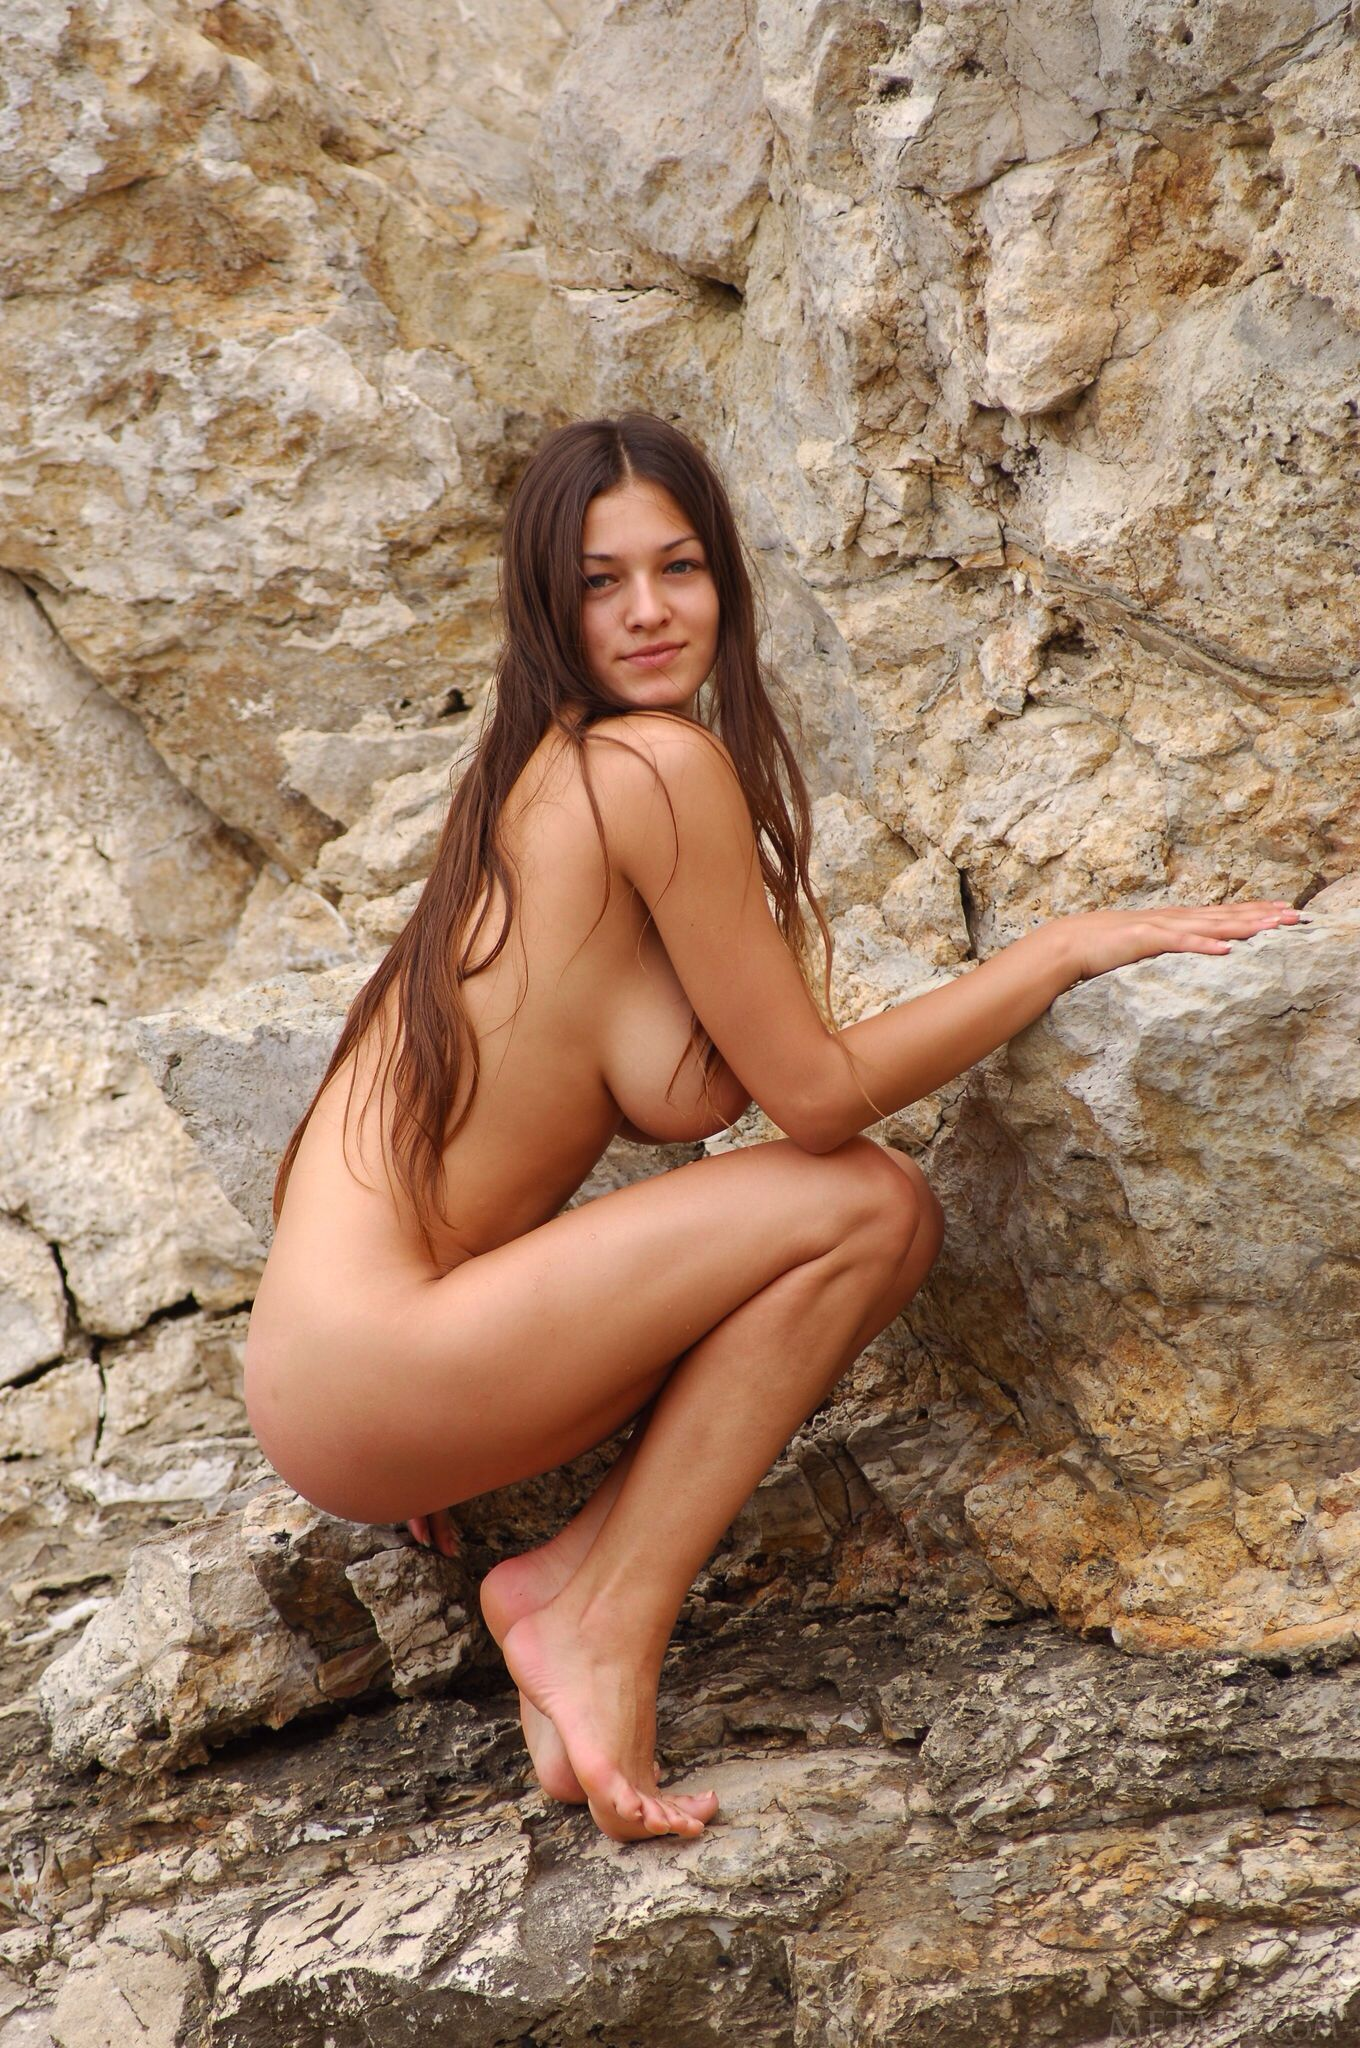 Teen nude sexy girls rocks